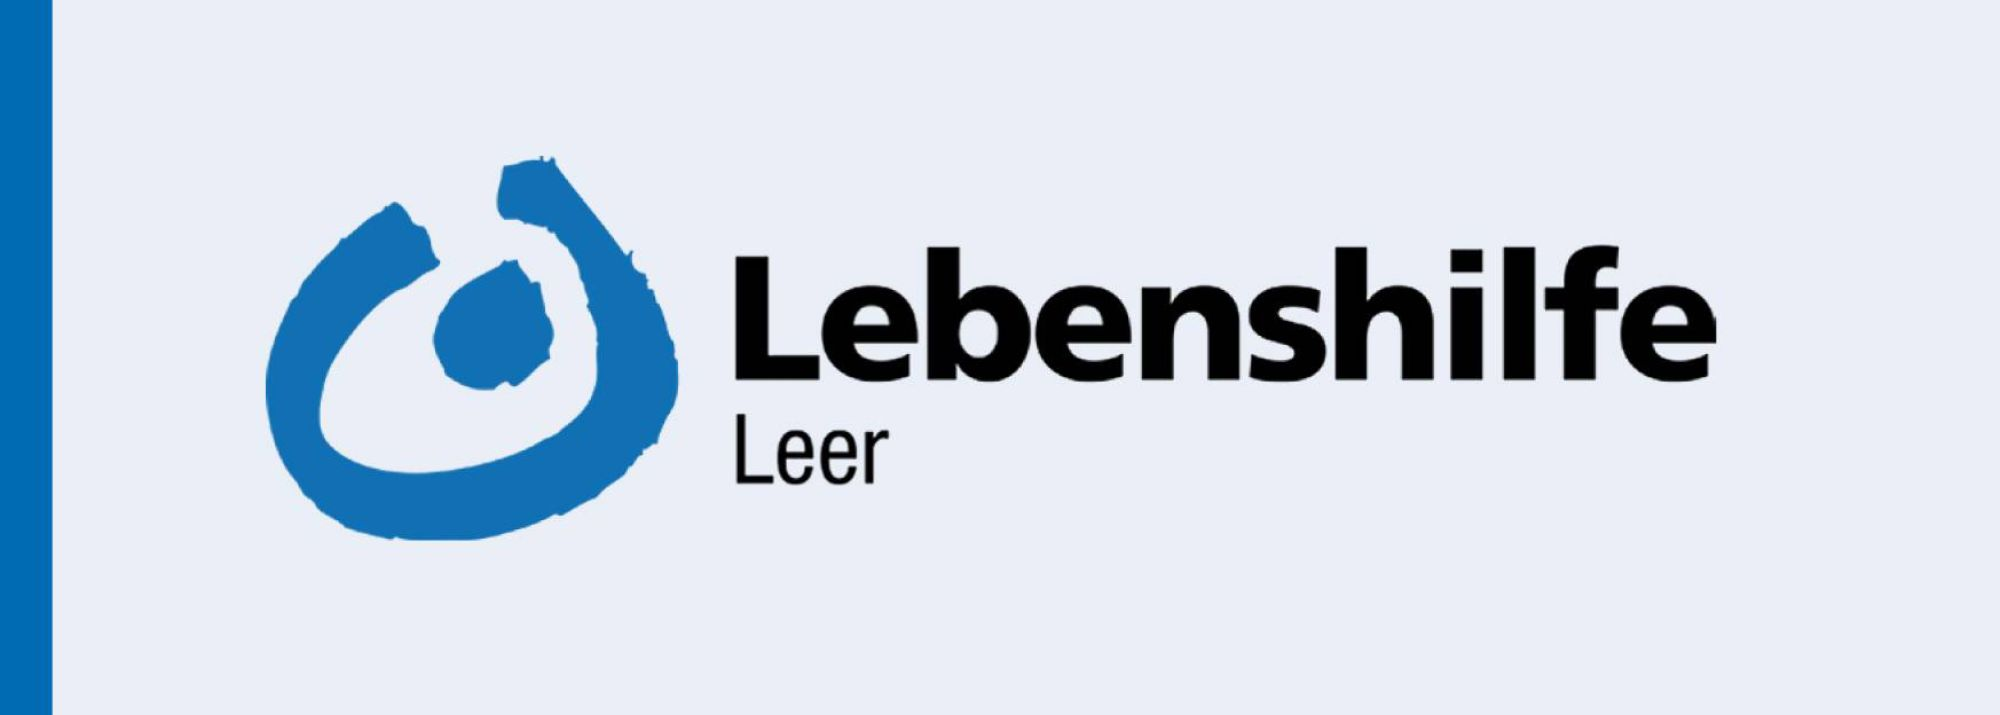 Solution_reference_Lebenshilfe_ Leer_Logo.jpg